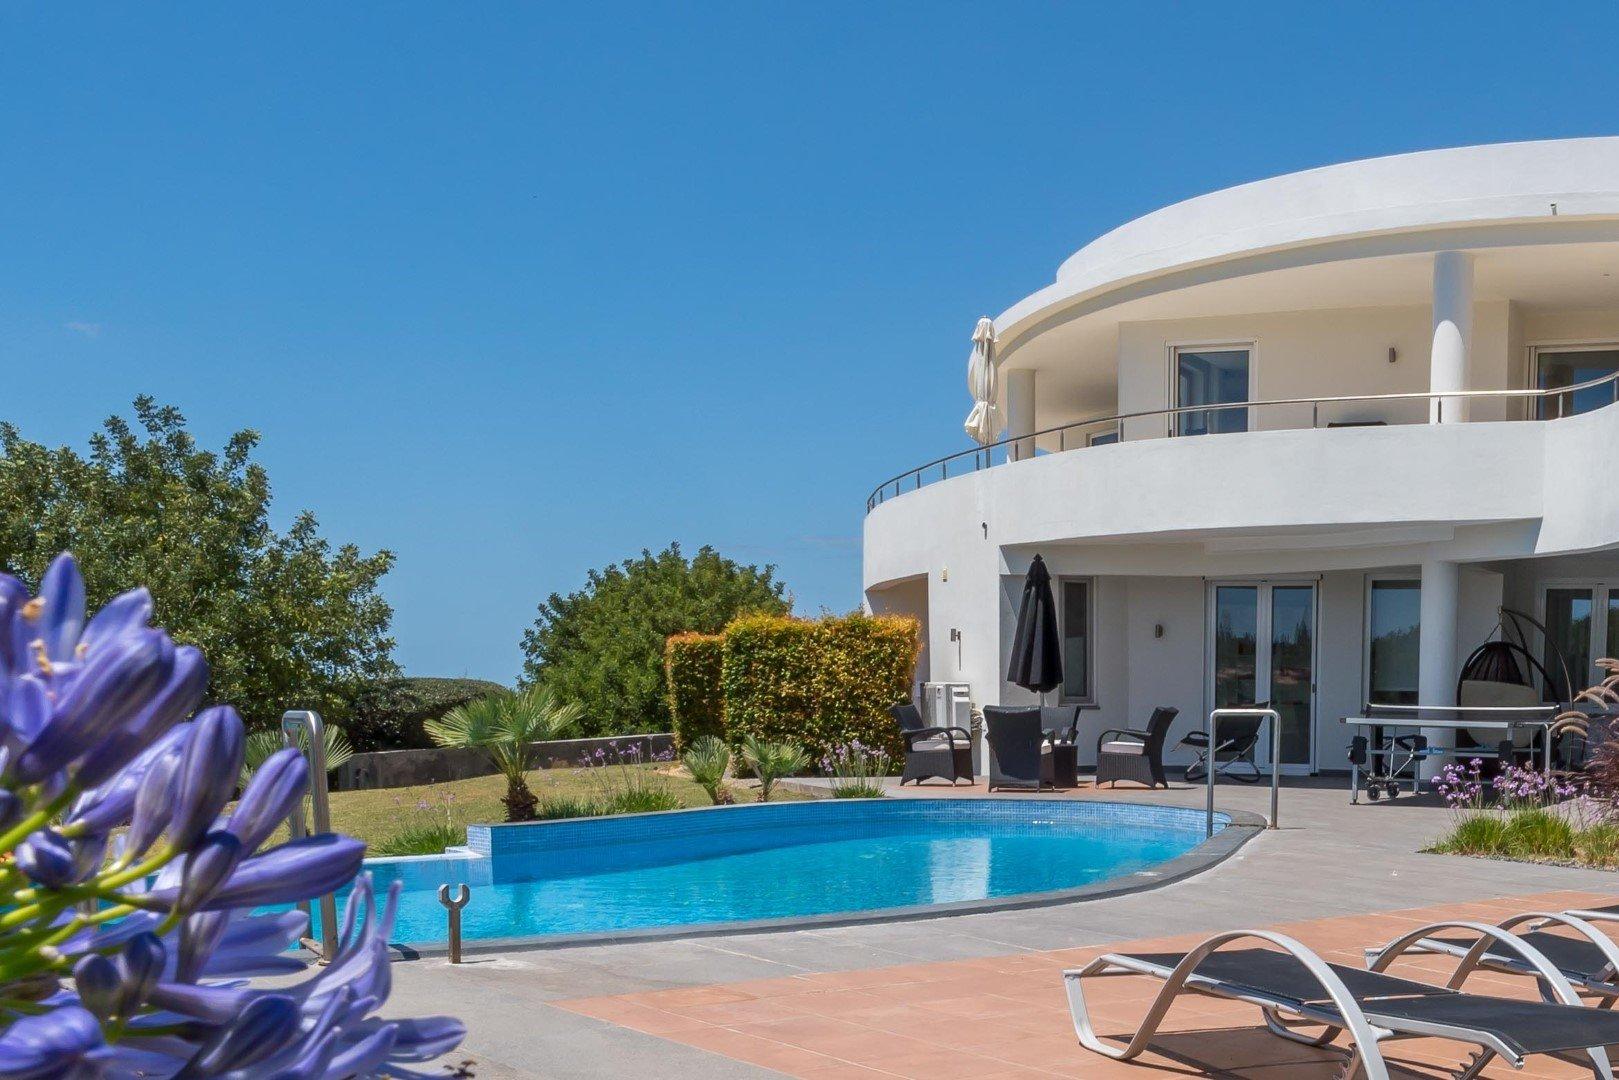 4 Bedroom Villa Almancil, Central Algarve Ref: MV24102